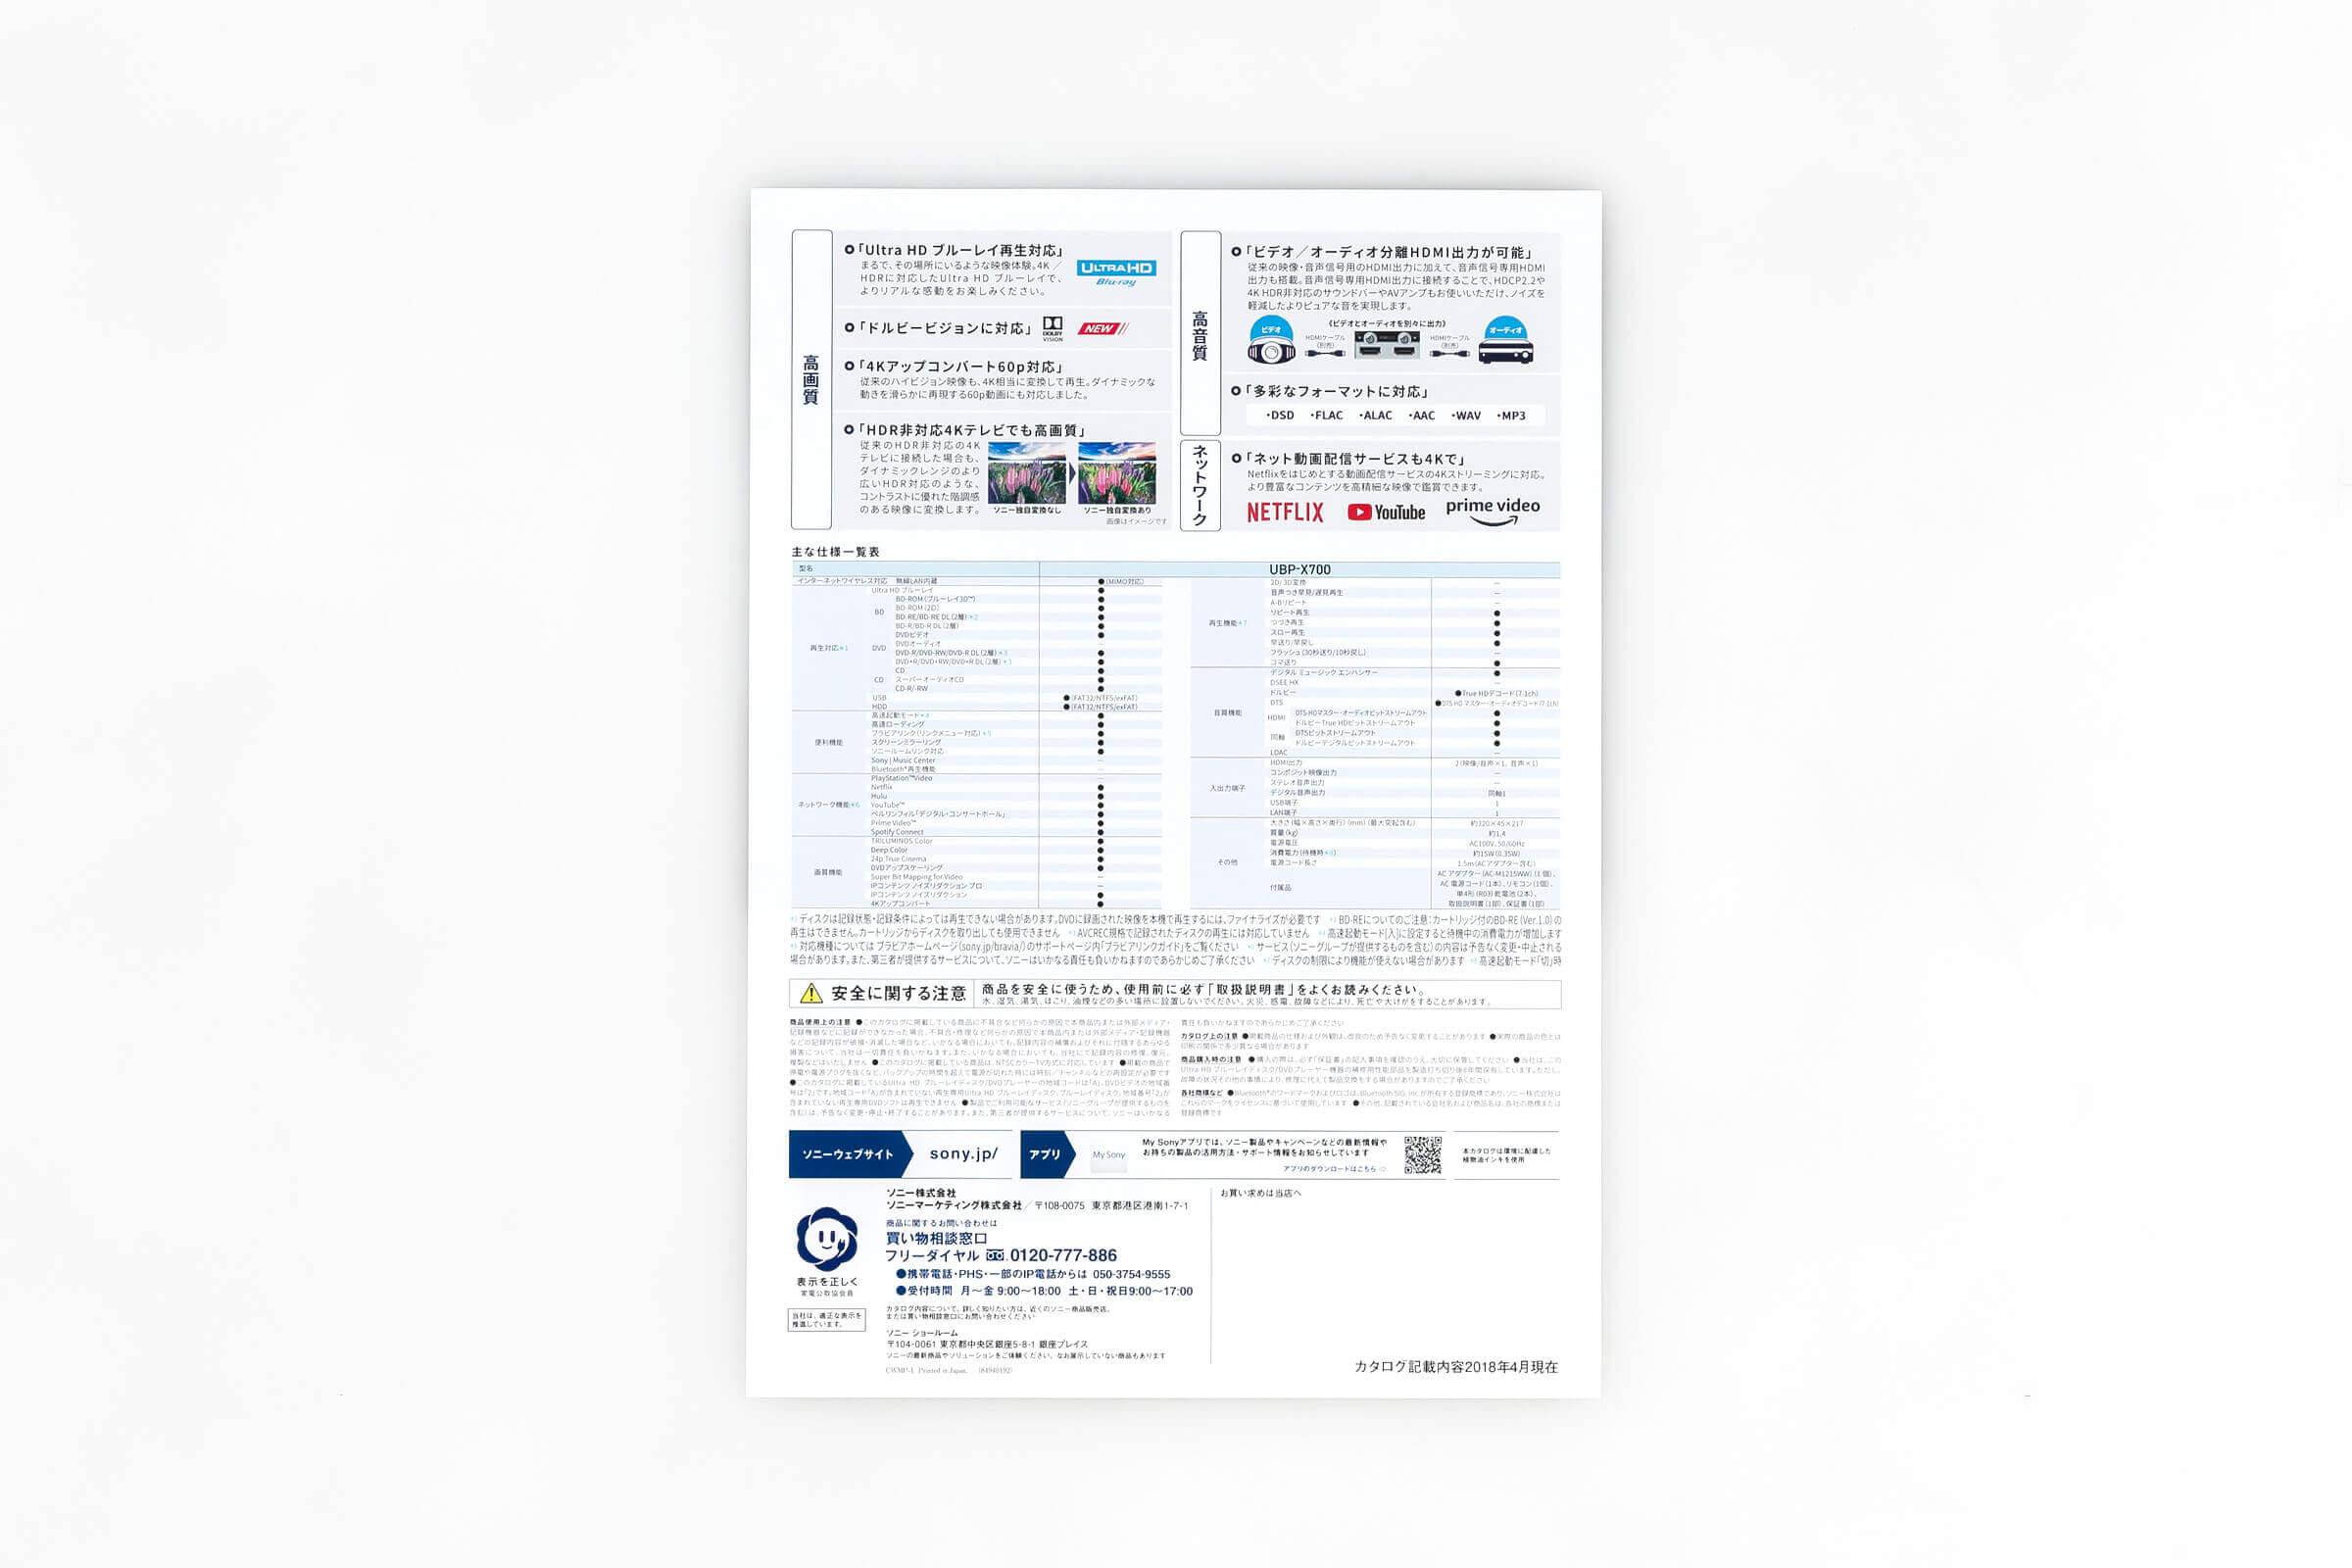 Ultra HDブルーレイ/DVDプレーヤー2018年新商品ニュース 裏面